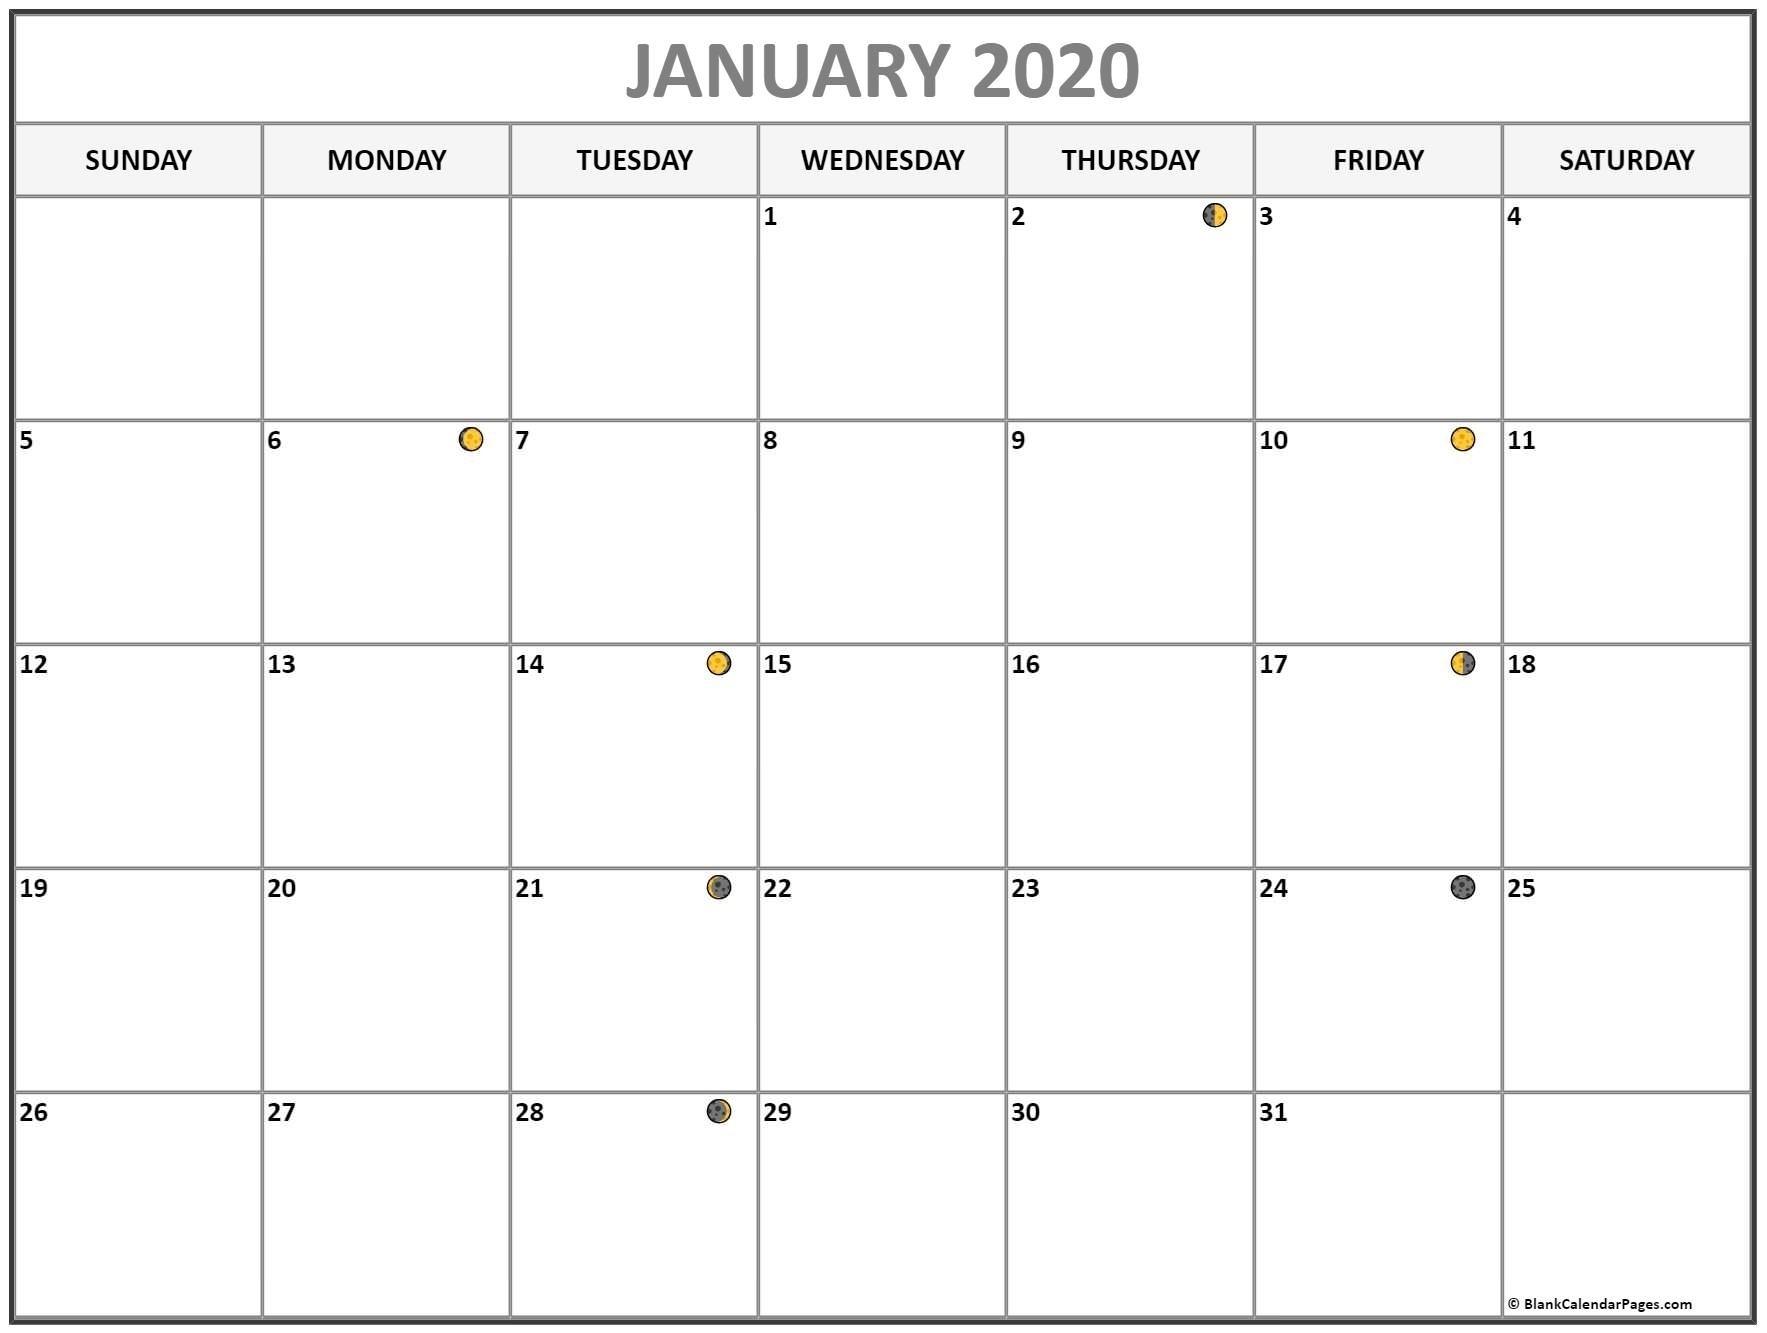 January 2020 Lunar Calendar | Moon Phase Calendar In Well-January 2020 Calendar With Moon Phases